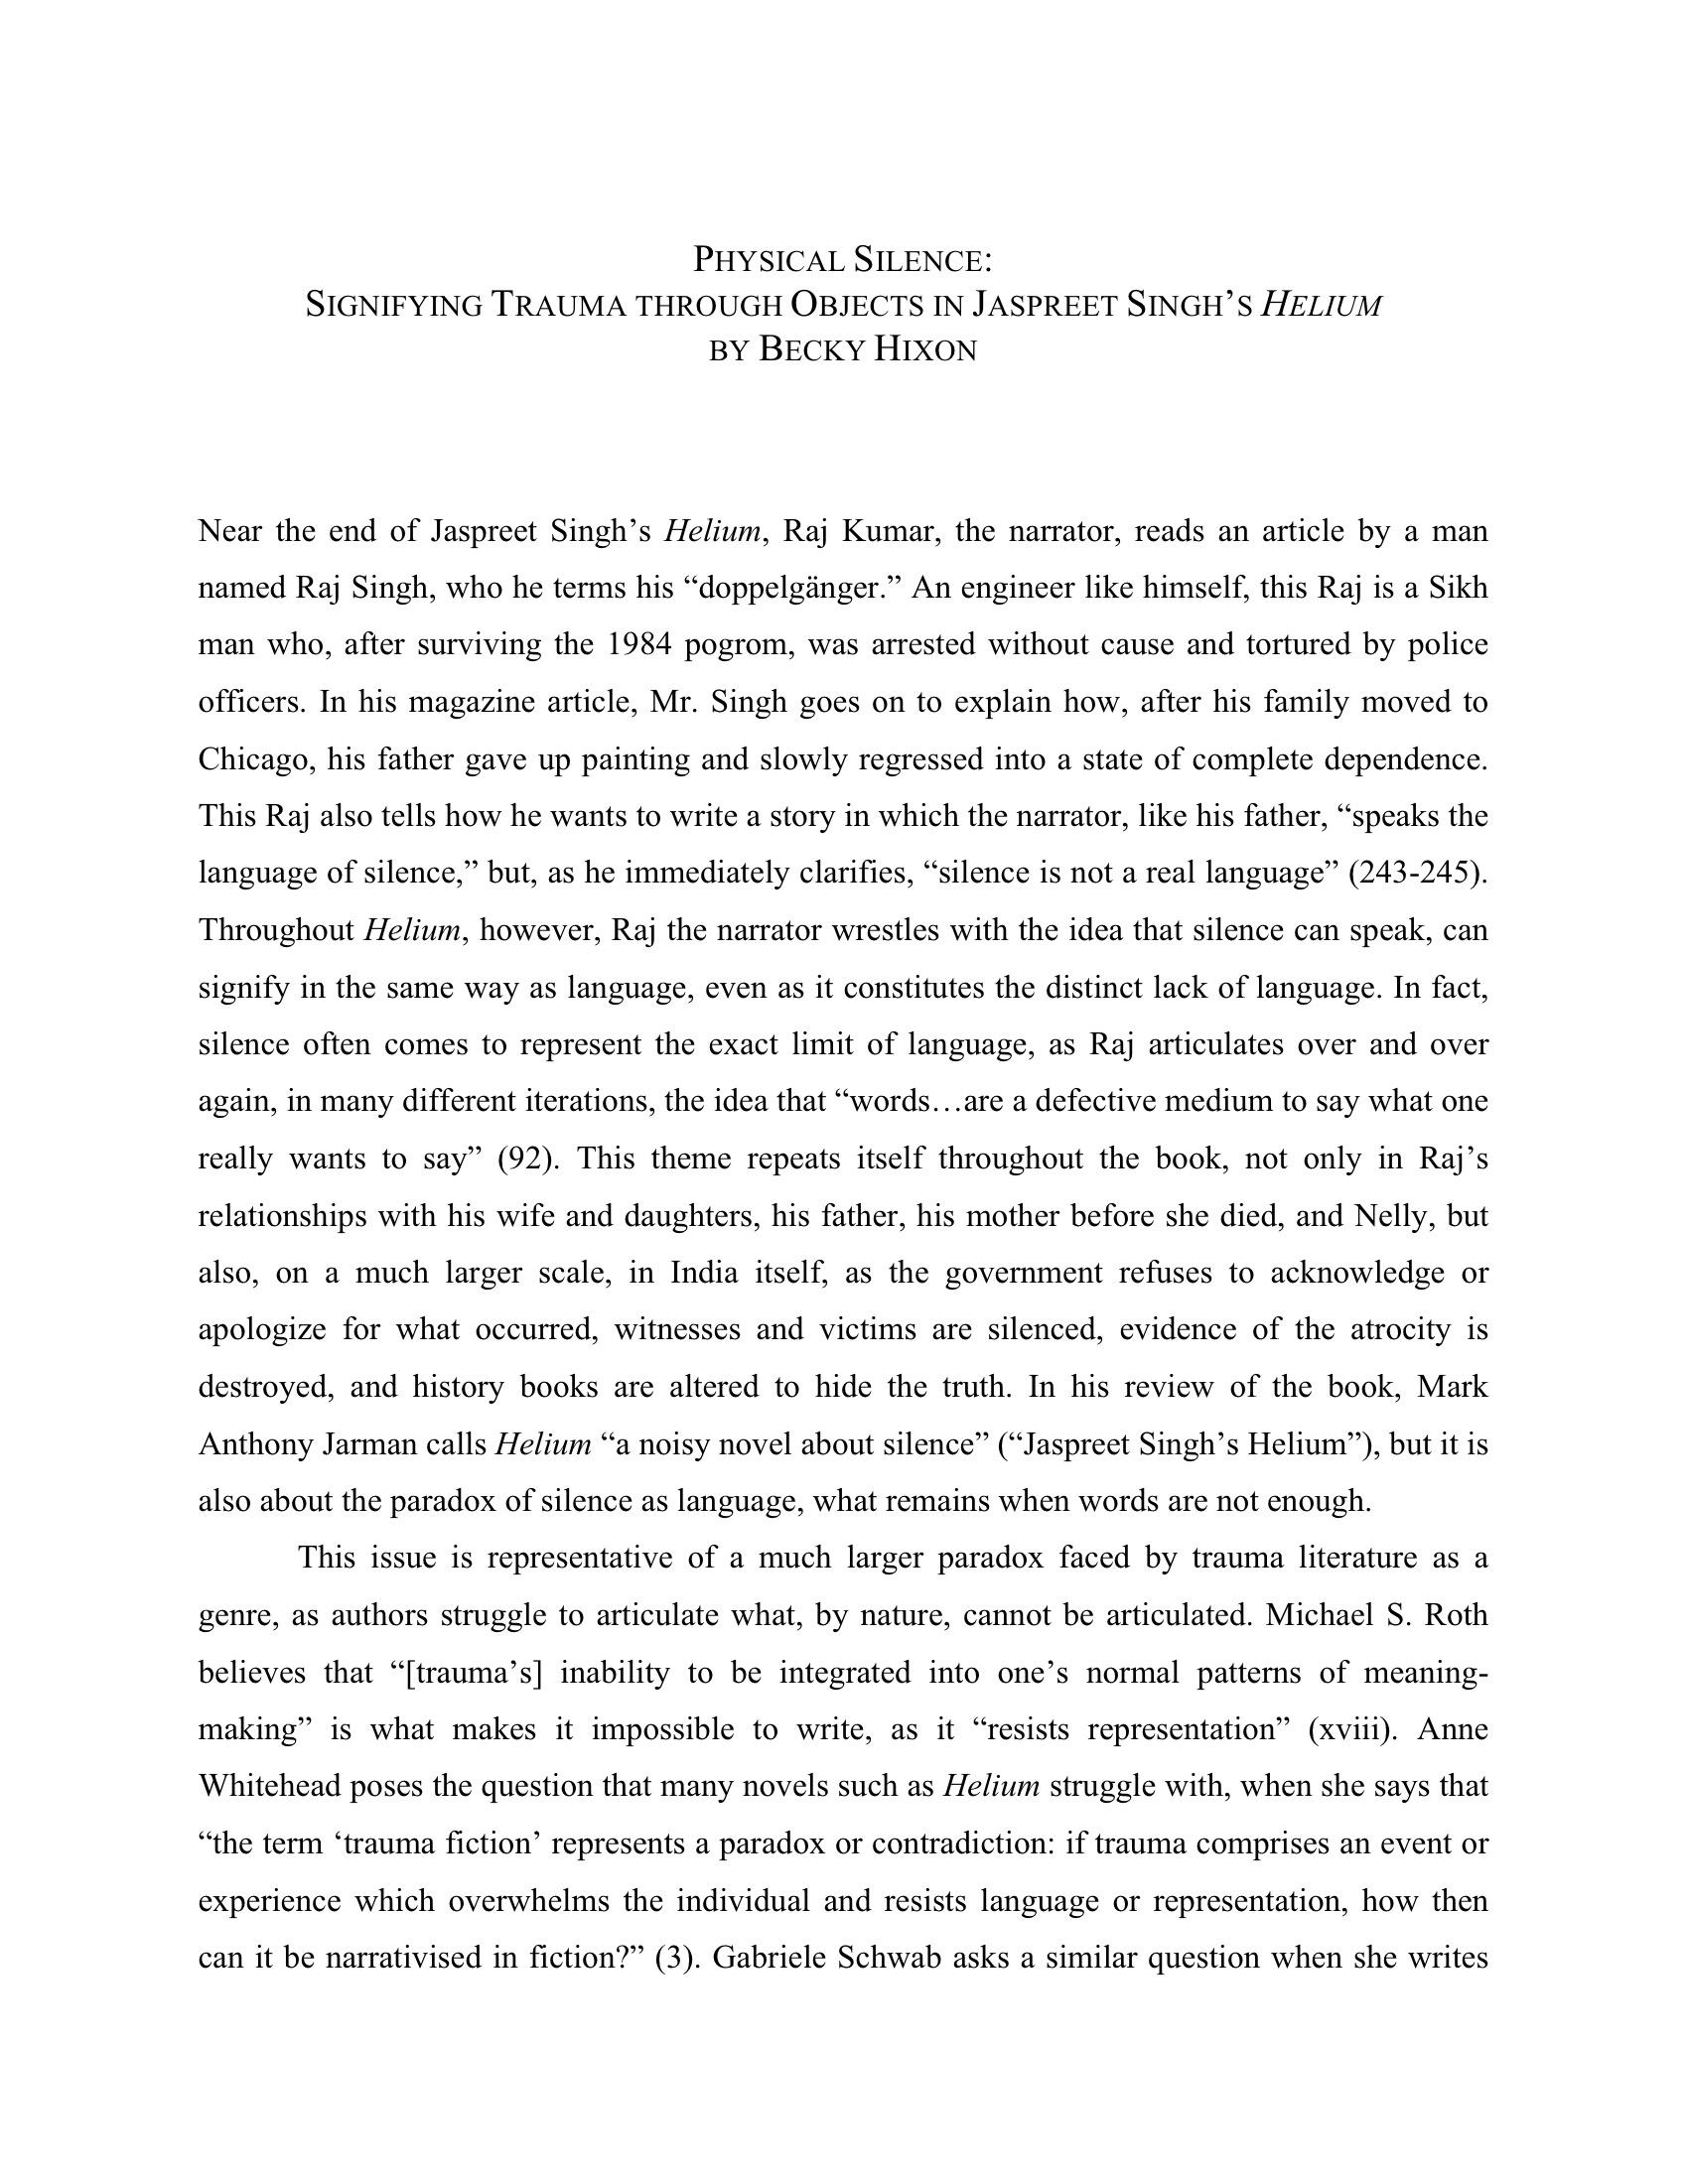 Physical Silence_ Signifying Trauma through Objects in Jaspreet Singh's Helium - Becky Hixon-1.jpeg